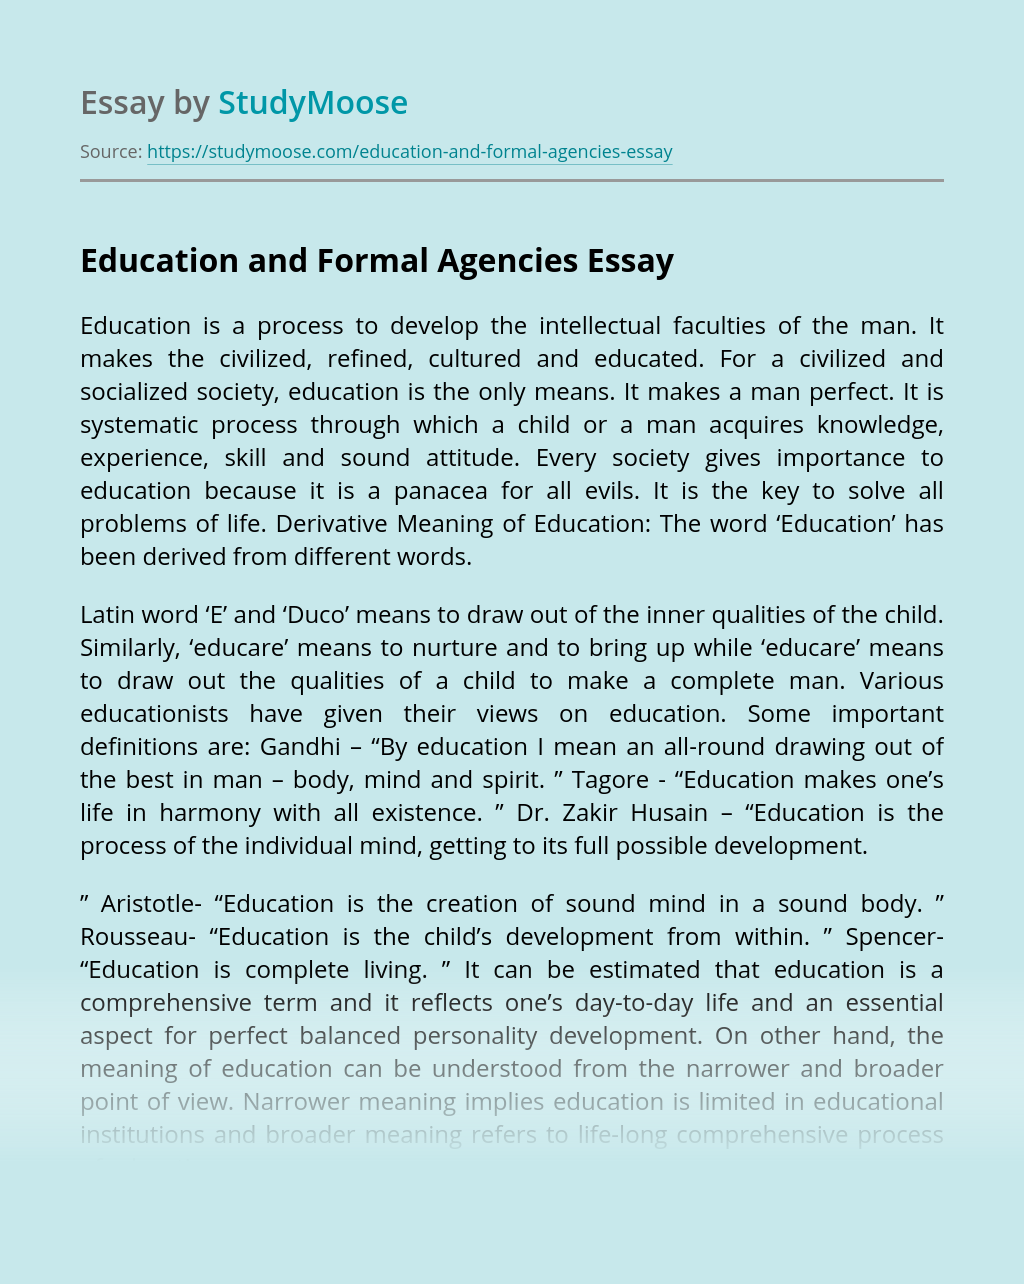 Education and Formal Agencies